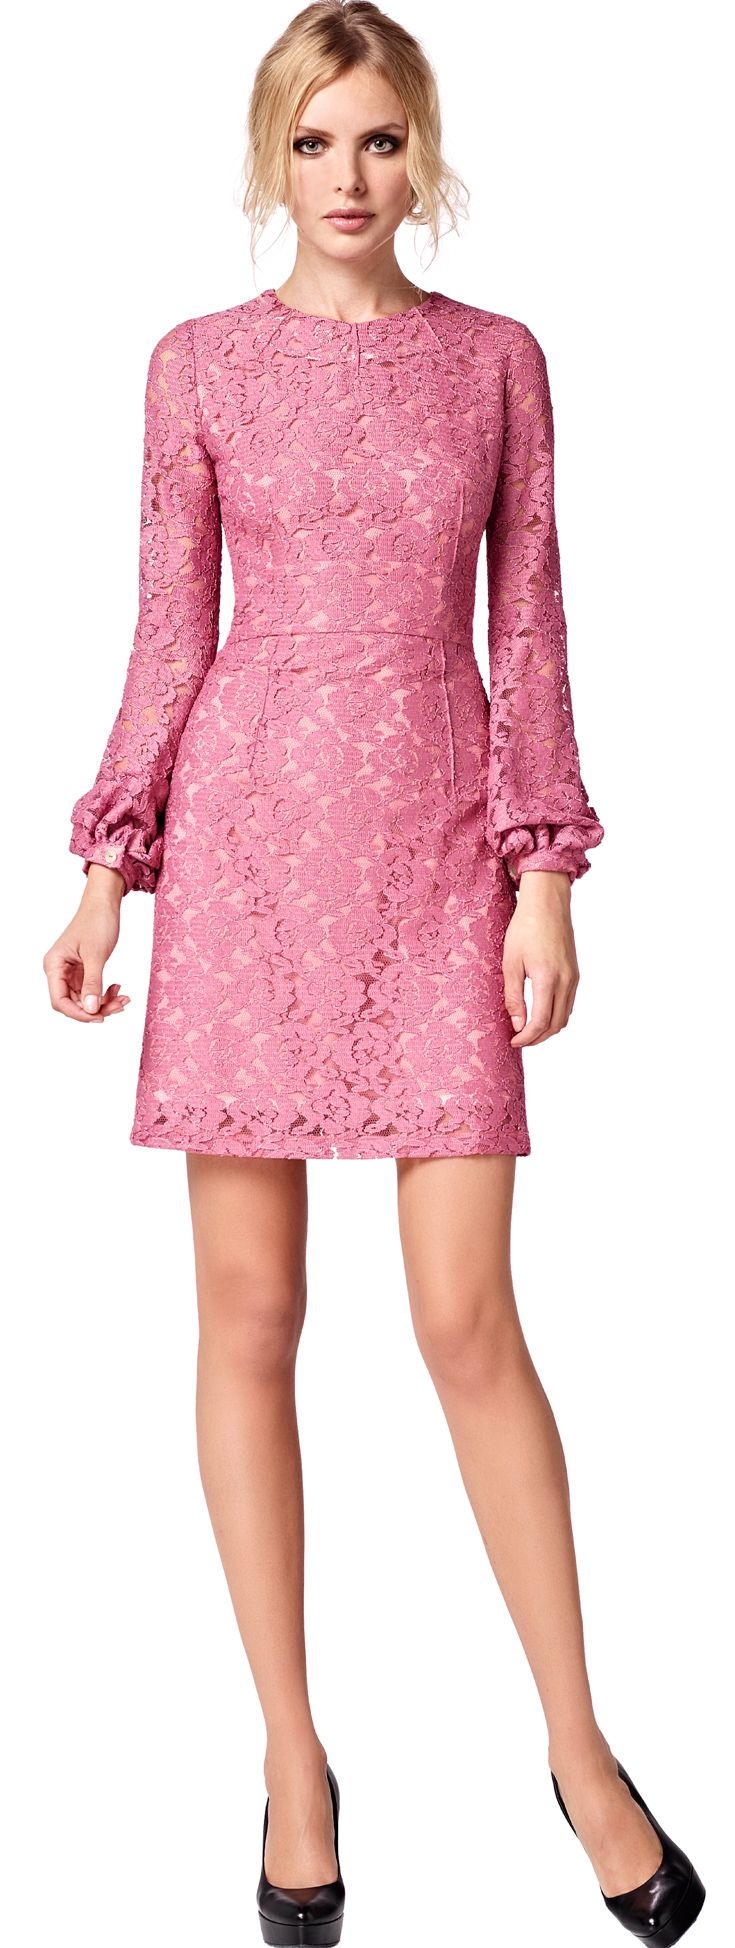 maya - rose lacela dress